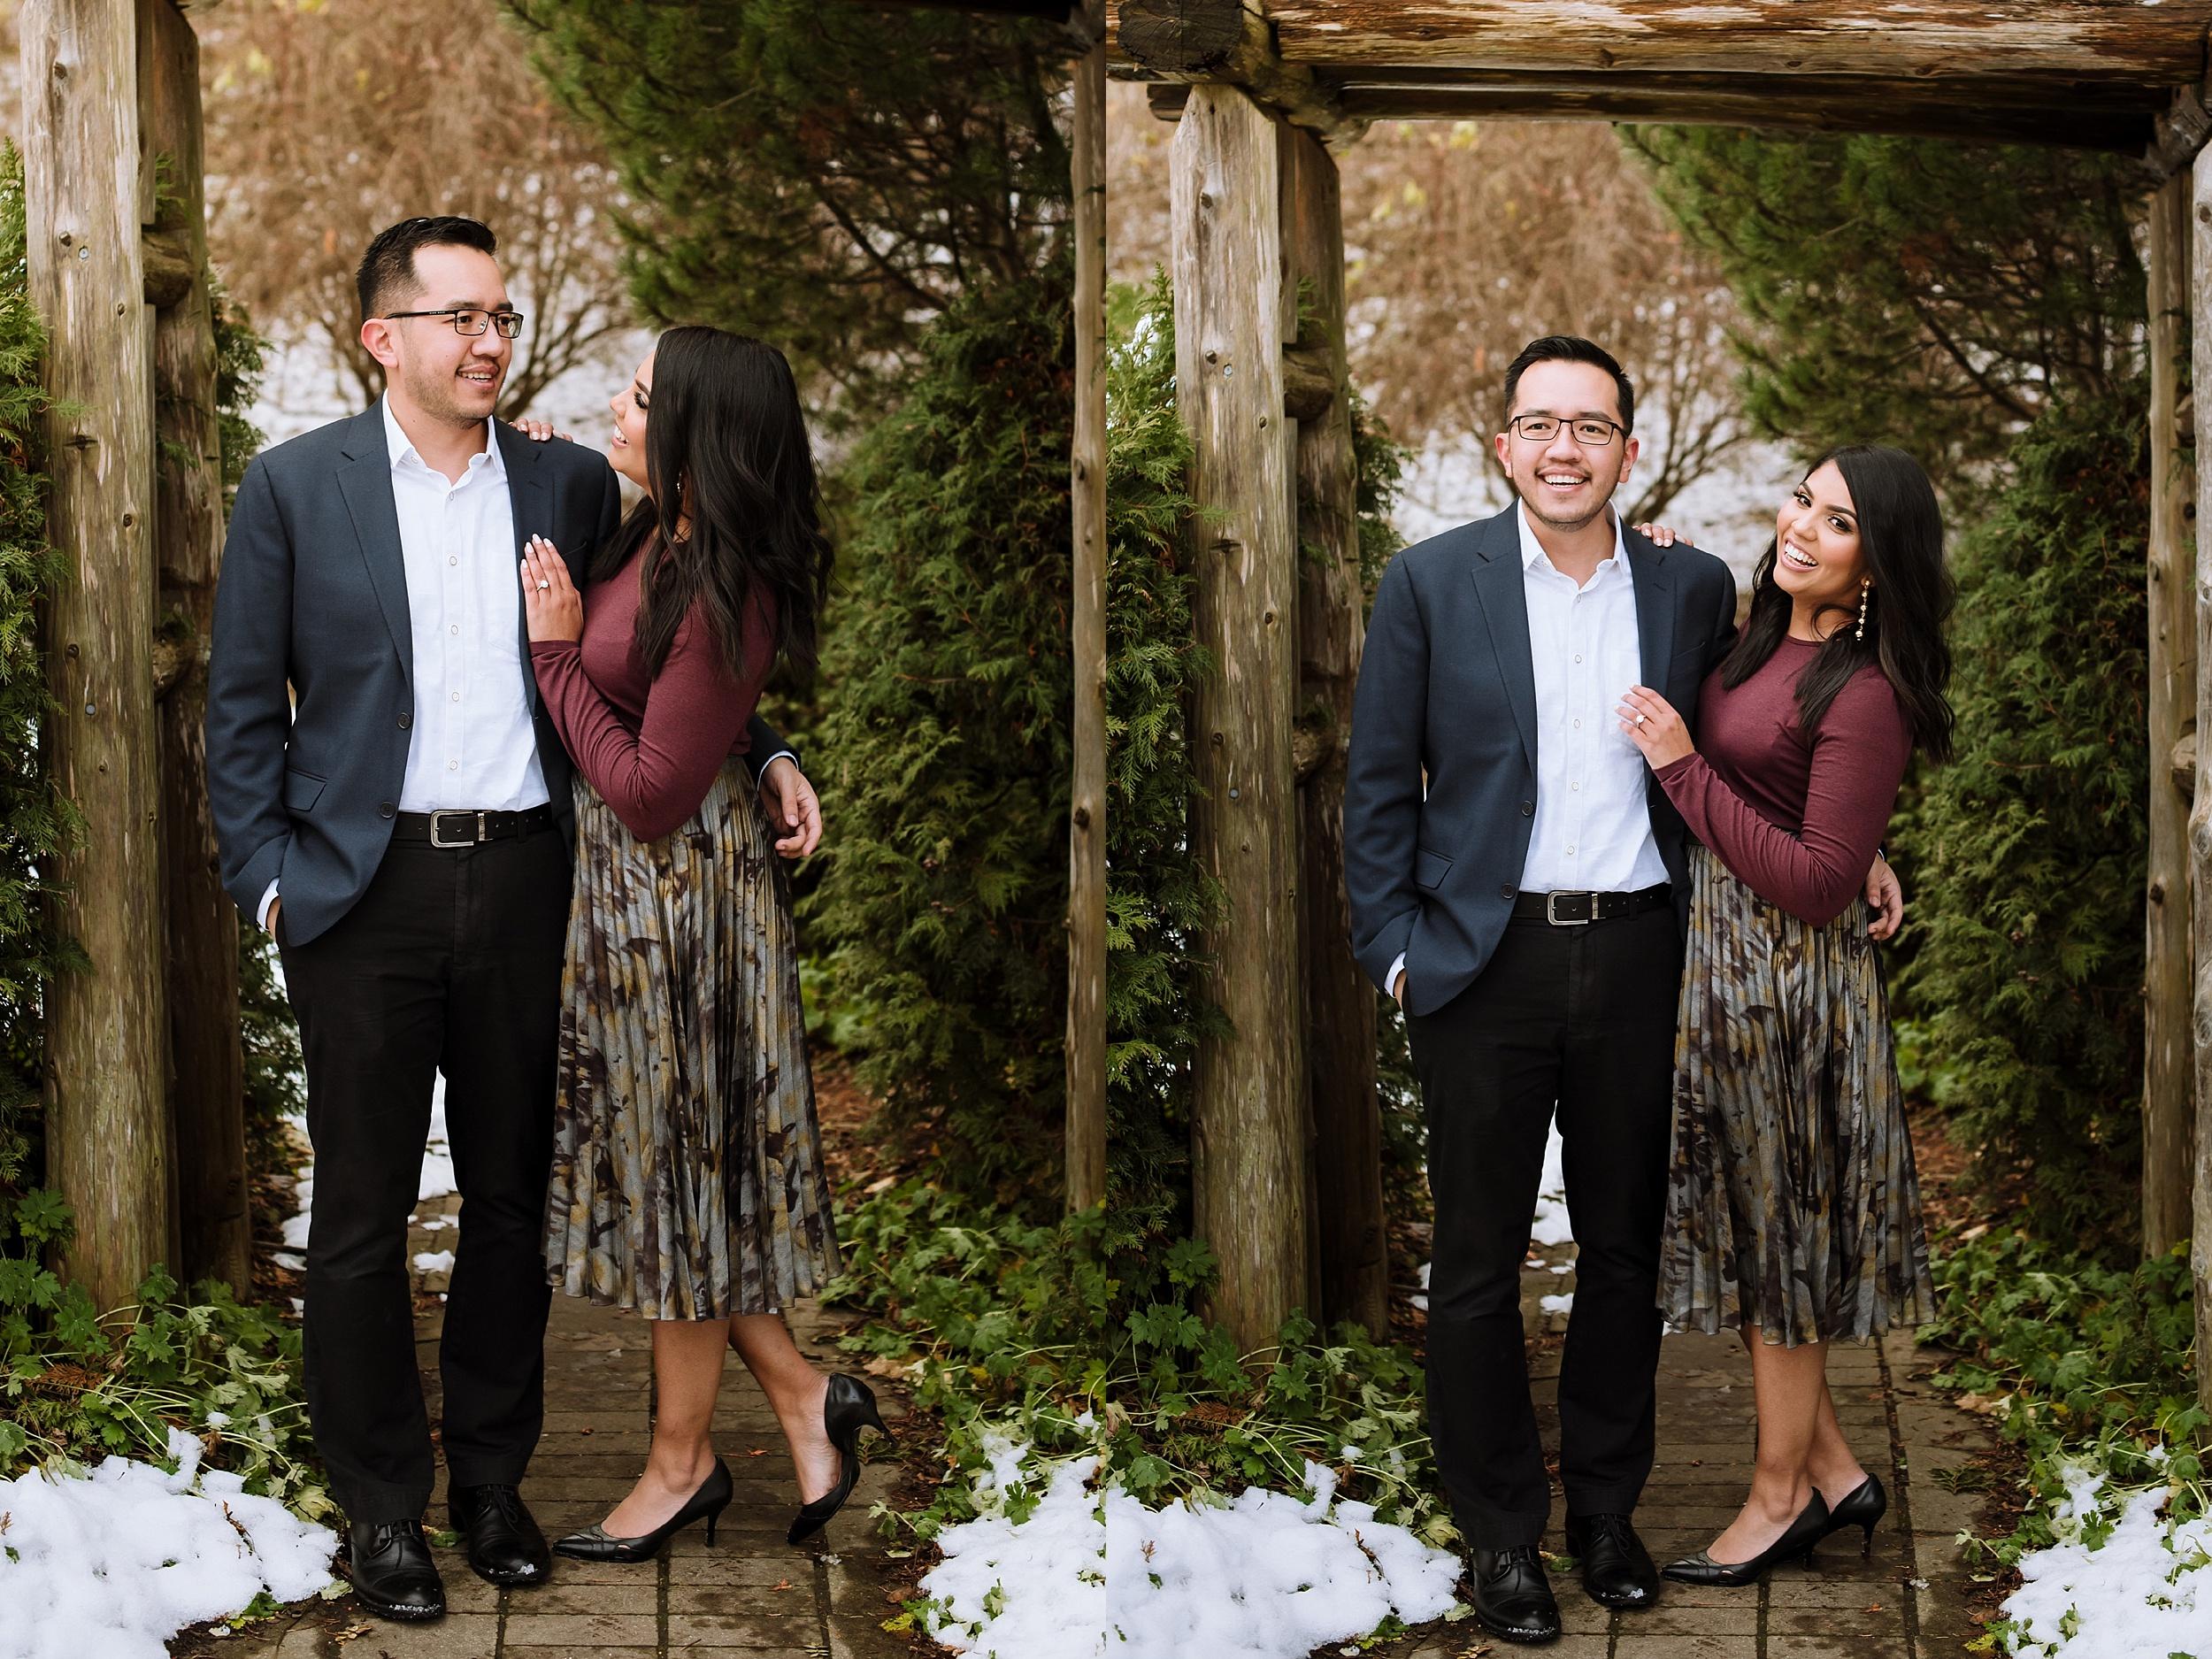 Alexander_Muir_Memorial_Gardens_Engagement_Shoot_Toronto_Wedding_Photographer_0007.jpg